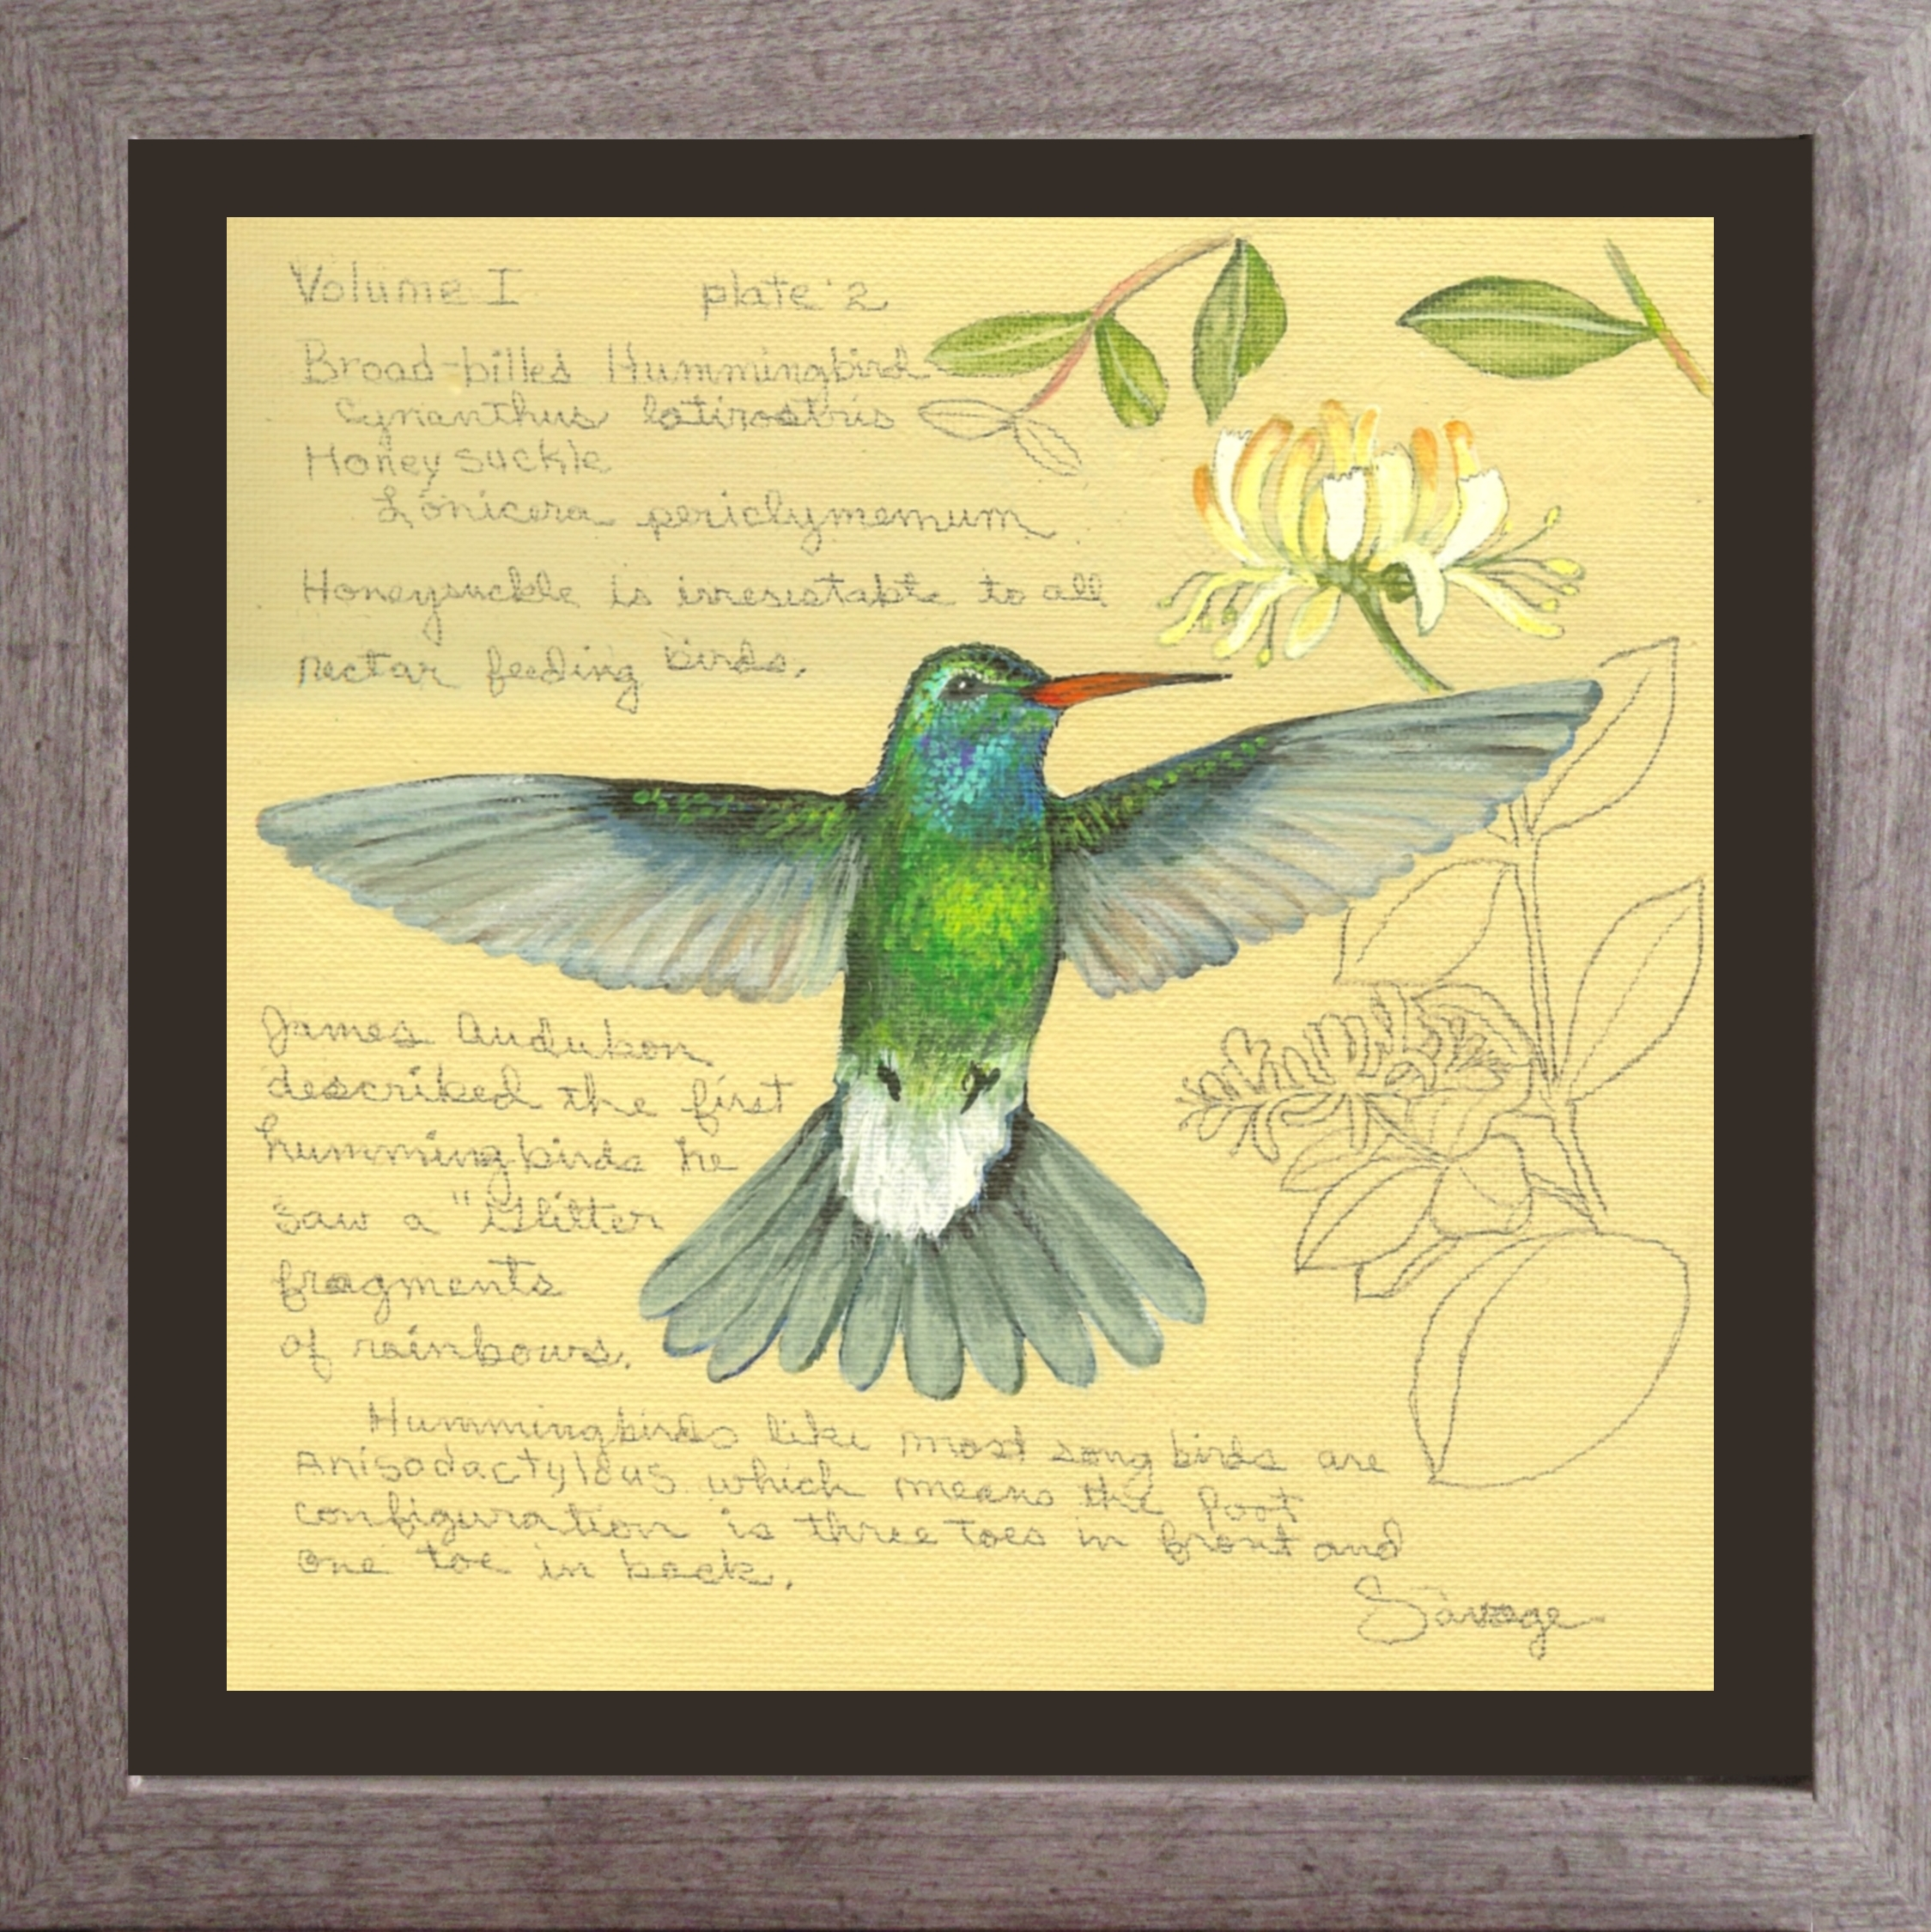 Broad-billed Hummingbird & Honeysuckle